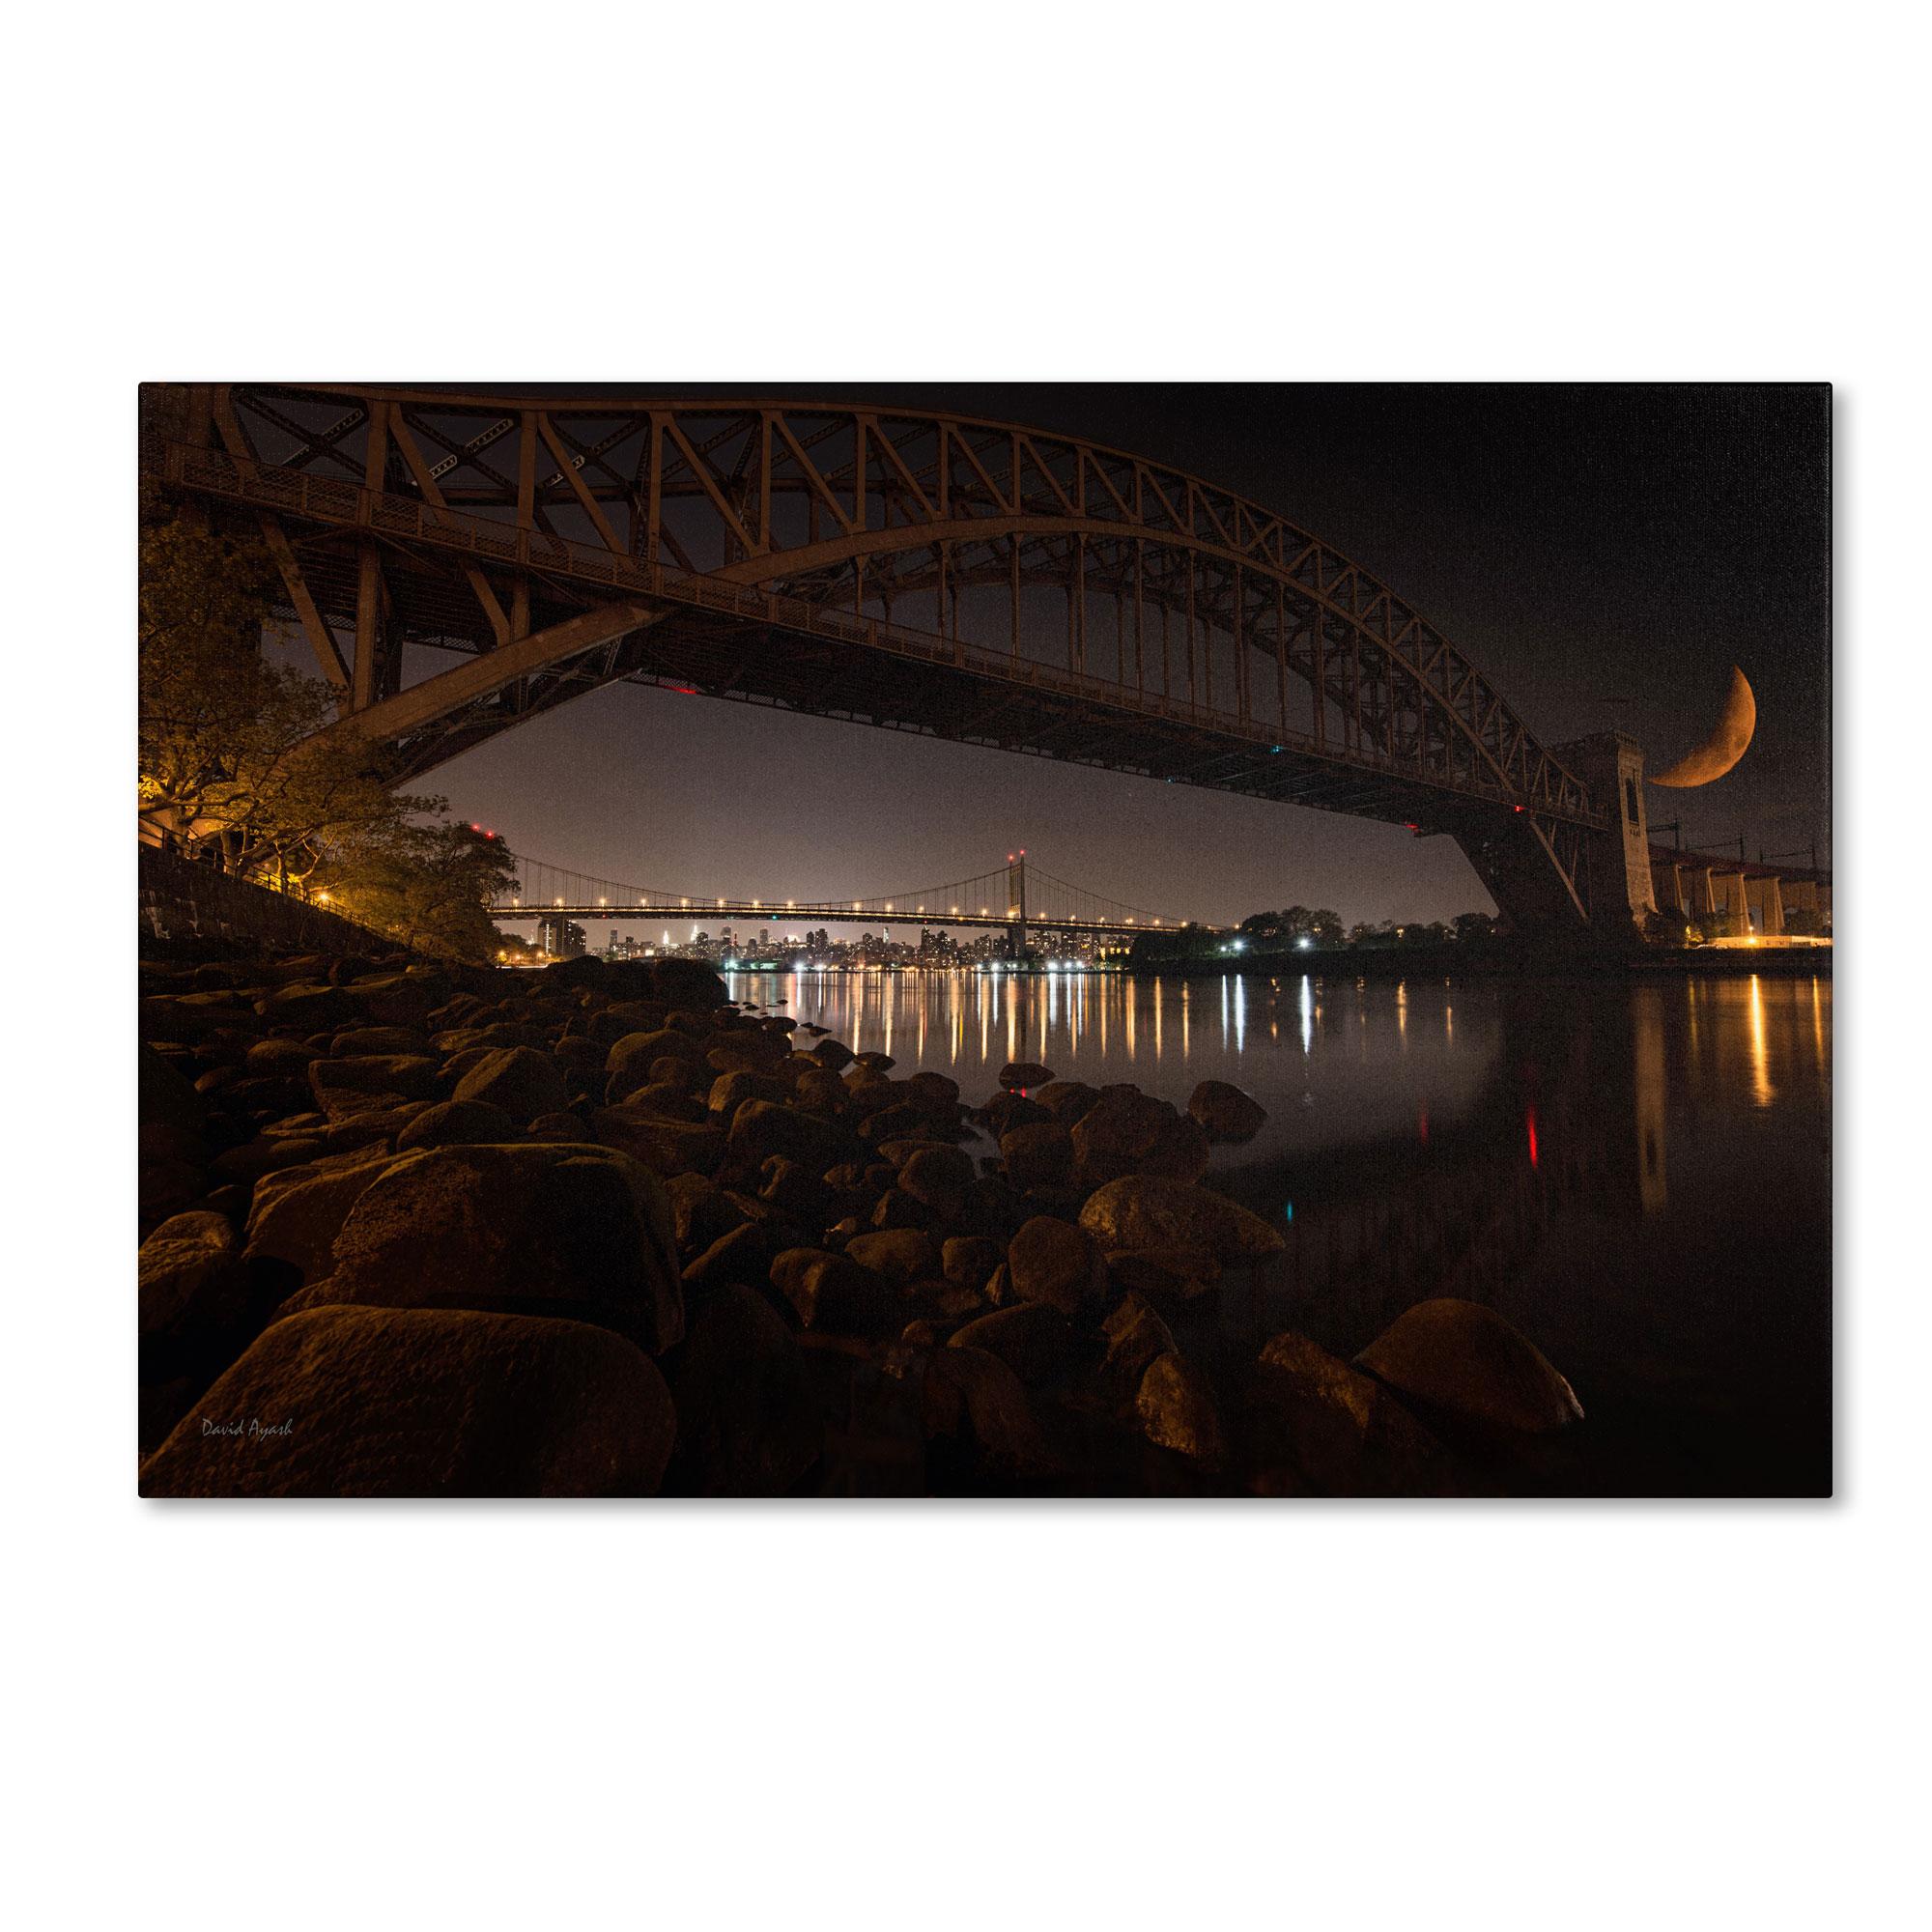 Trademark Global David Ayash 'Hells Gate and RFK Bridge - NYC' Canvas Art PartNumber: 021V002804269000P KsnValue: 2804269 MfgPartNumber: MA0512-C1219GG